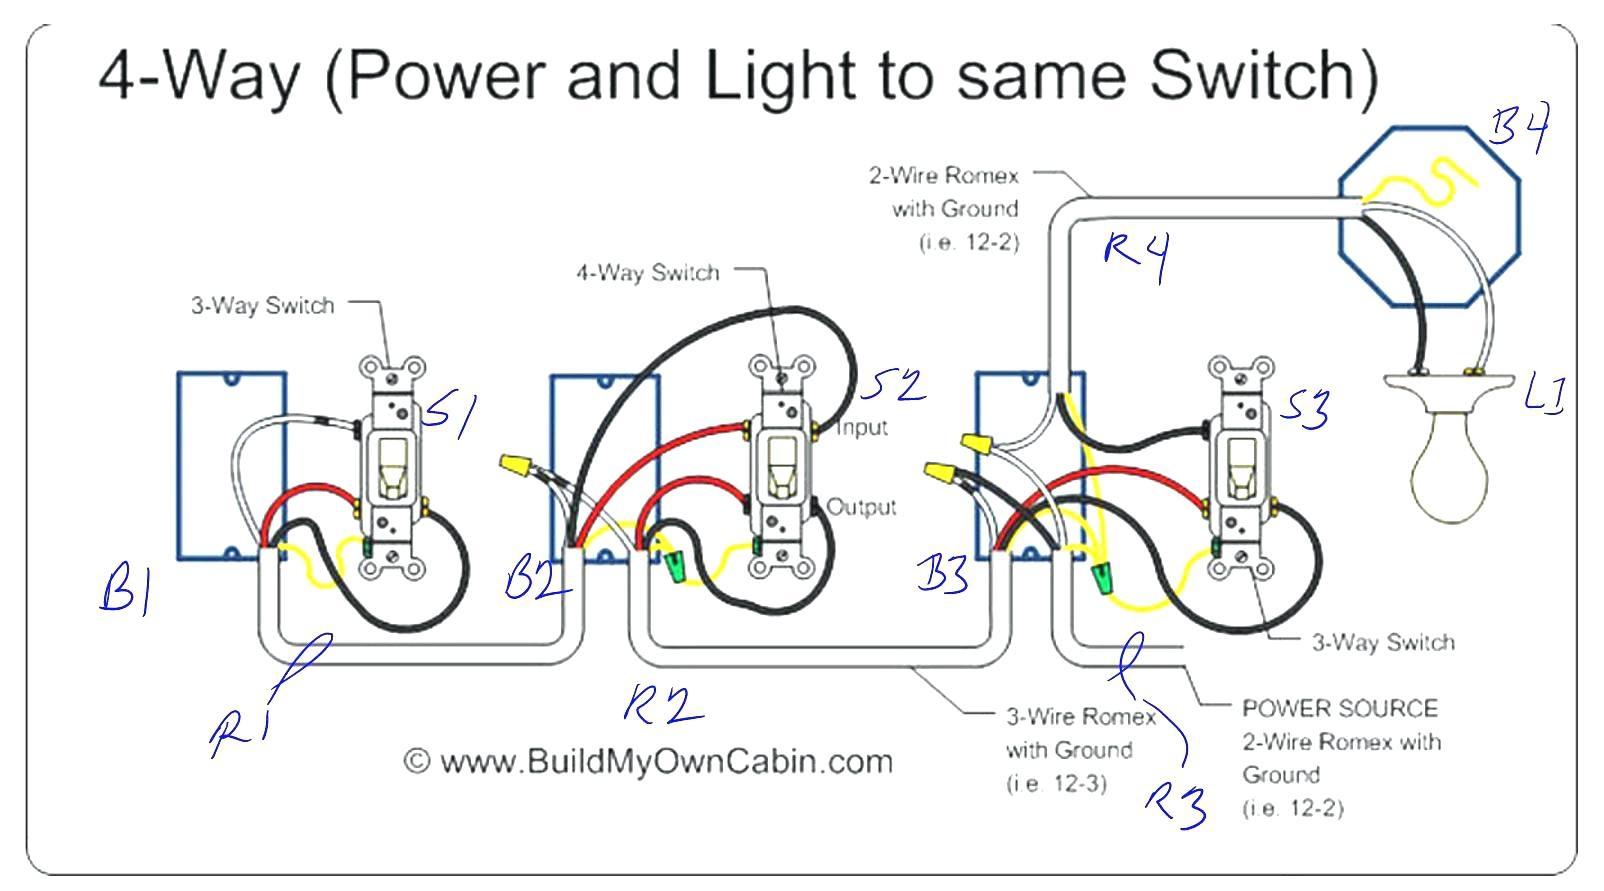 Sensor 4 Wire Wiring Diagram Get Free Image About Wiring Diagram